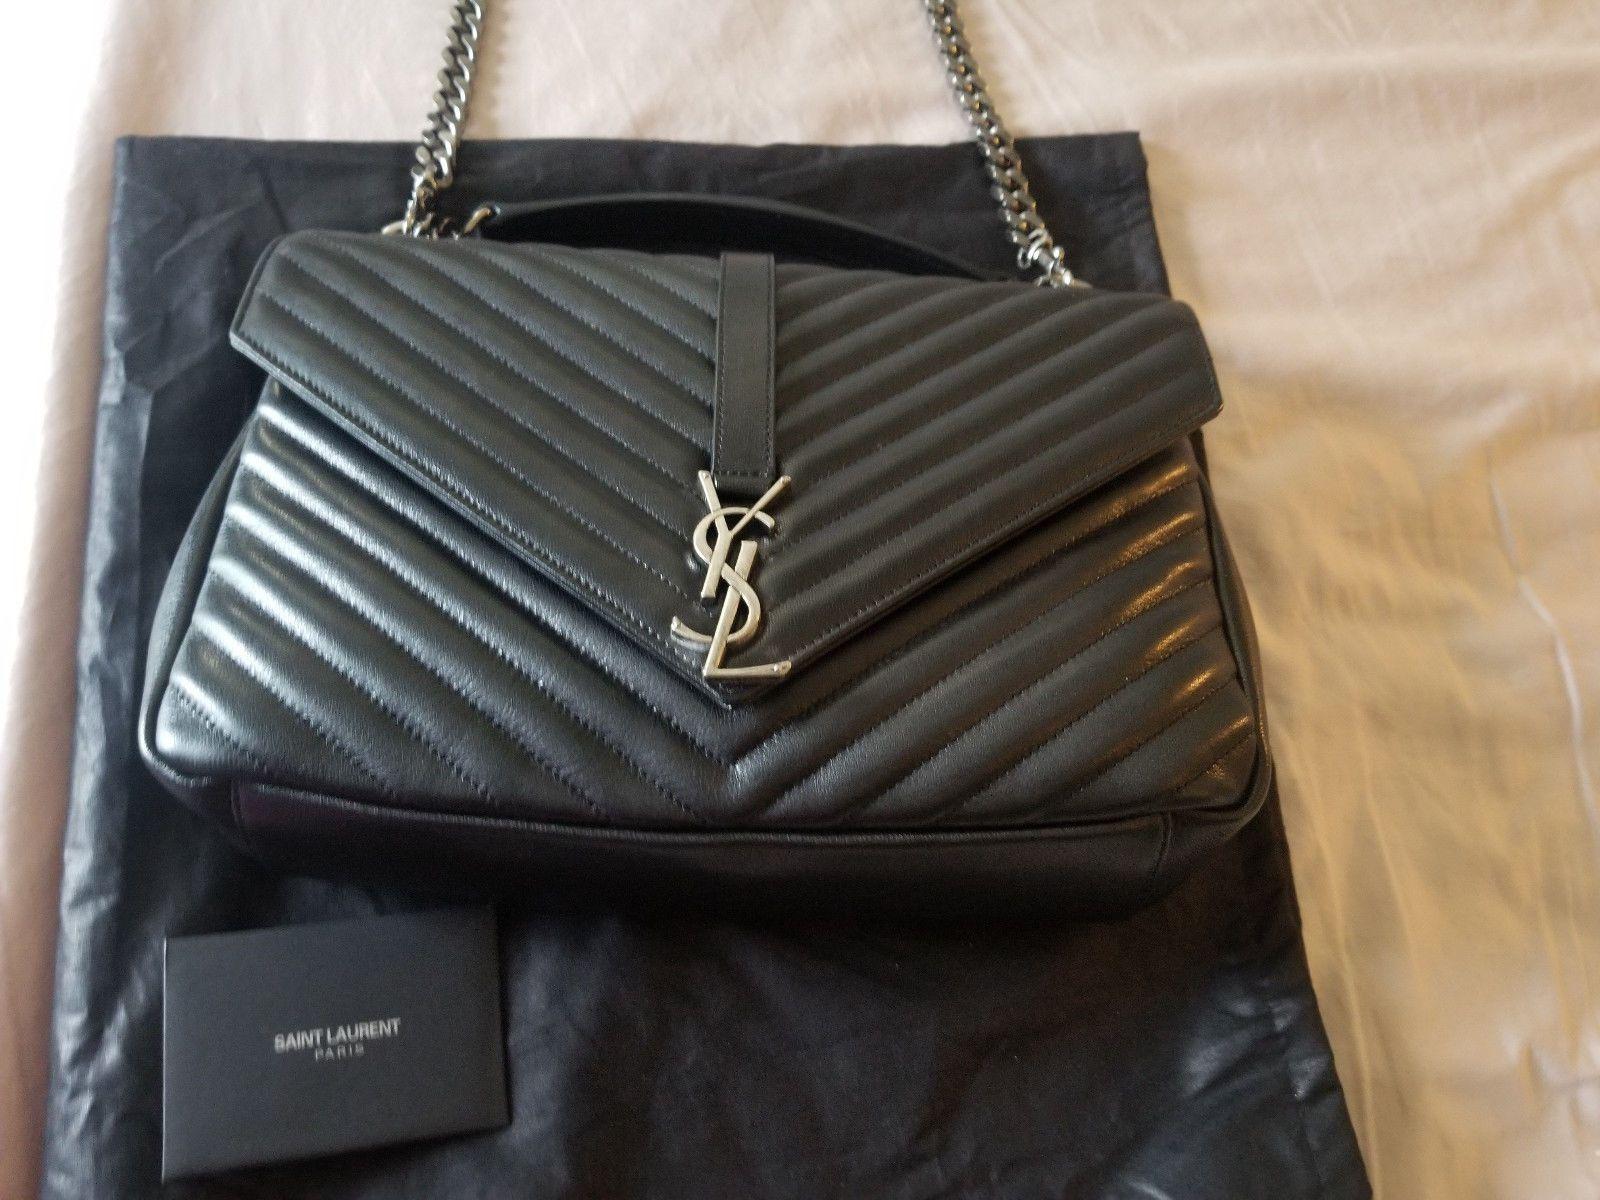 e97119b151 ysl monogramme medium college bag dark beige  39273756 beige  -  310.25 USD    Bagaholicsbags.se Bagaholics - Buy Designer Handbags